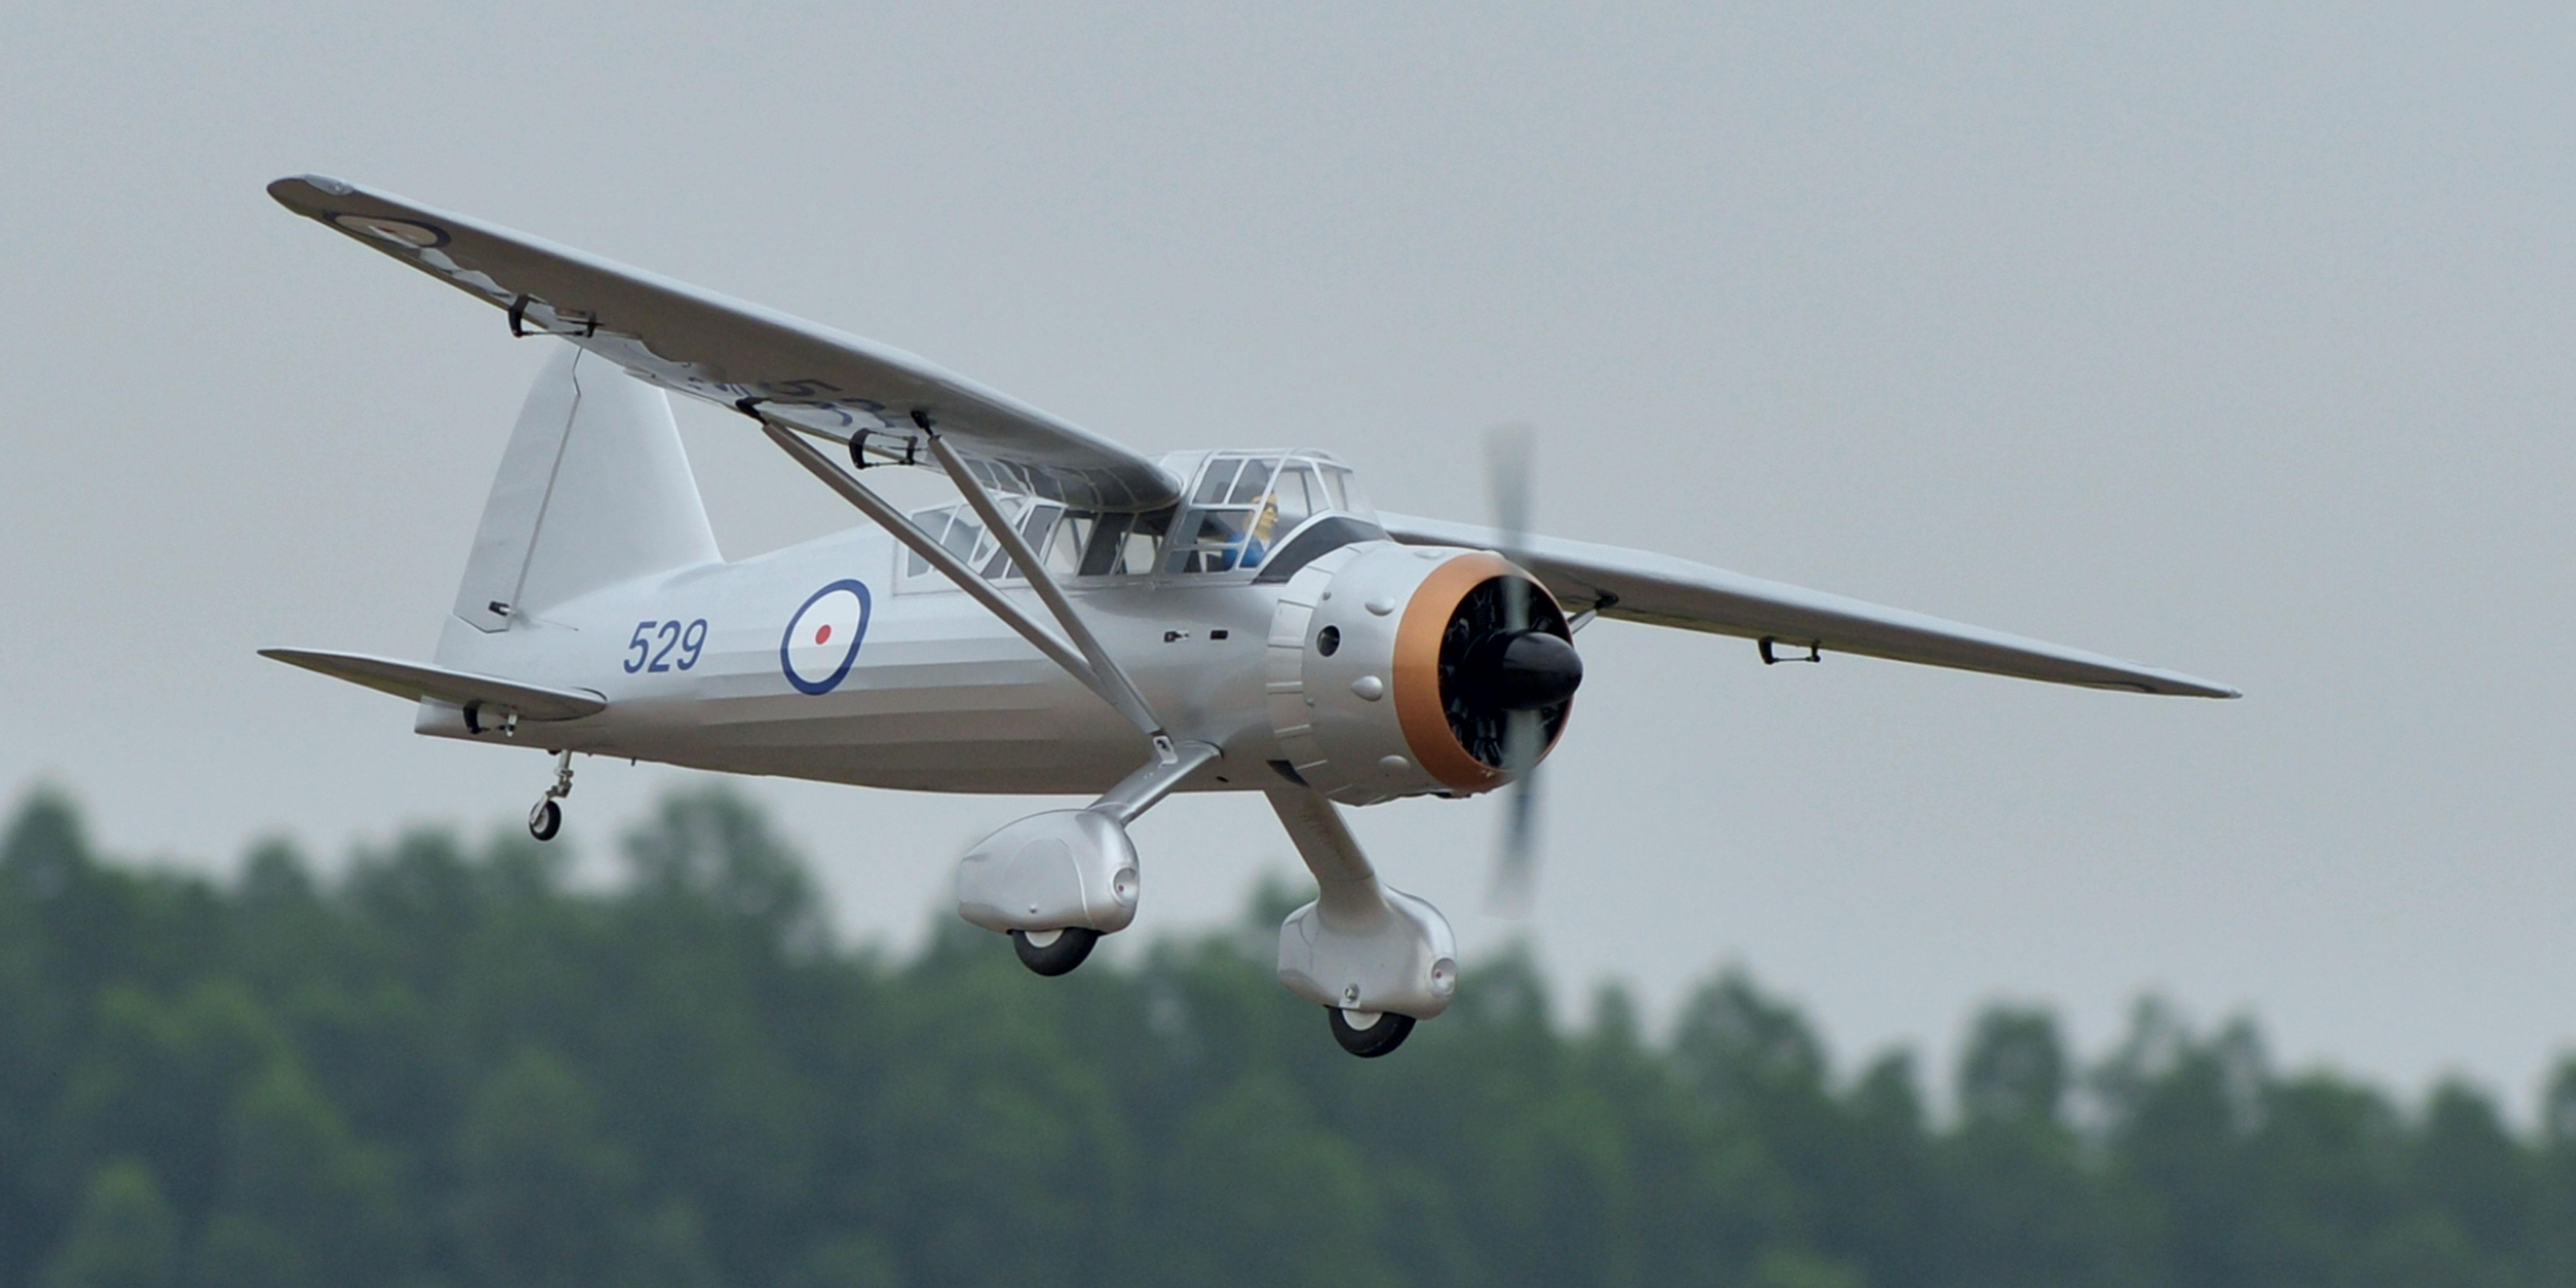 Phoenixmodel com | Phoenixmodel | Aircraft model Manufacturer